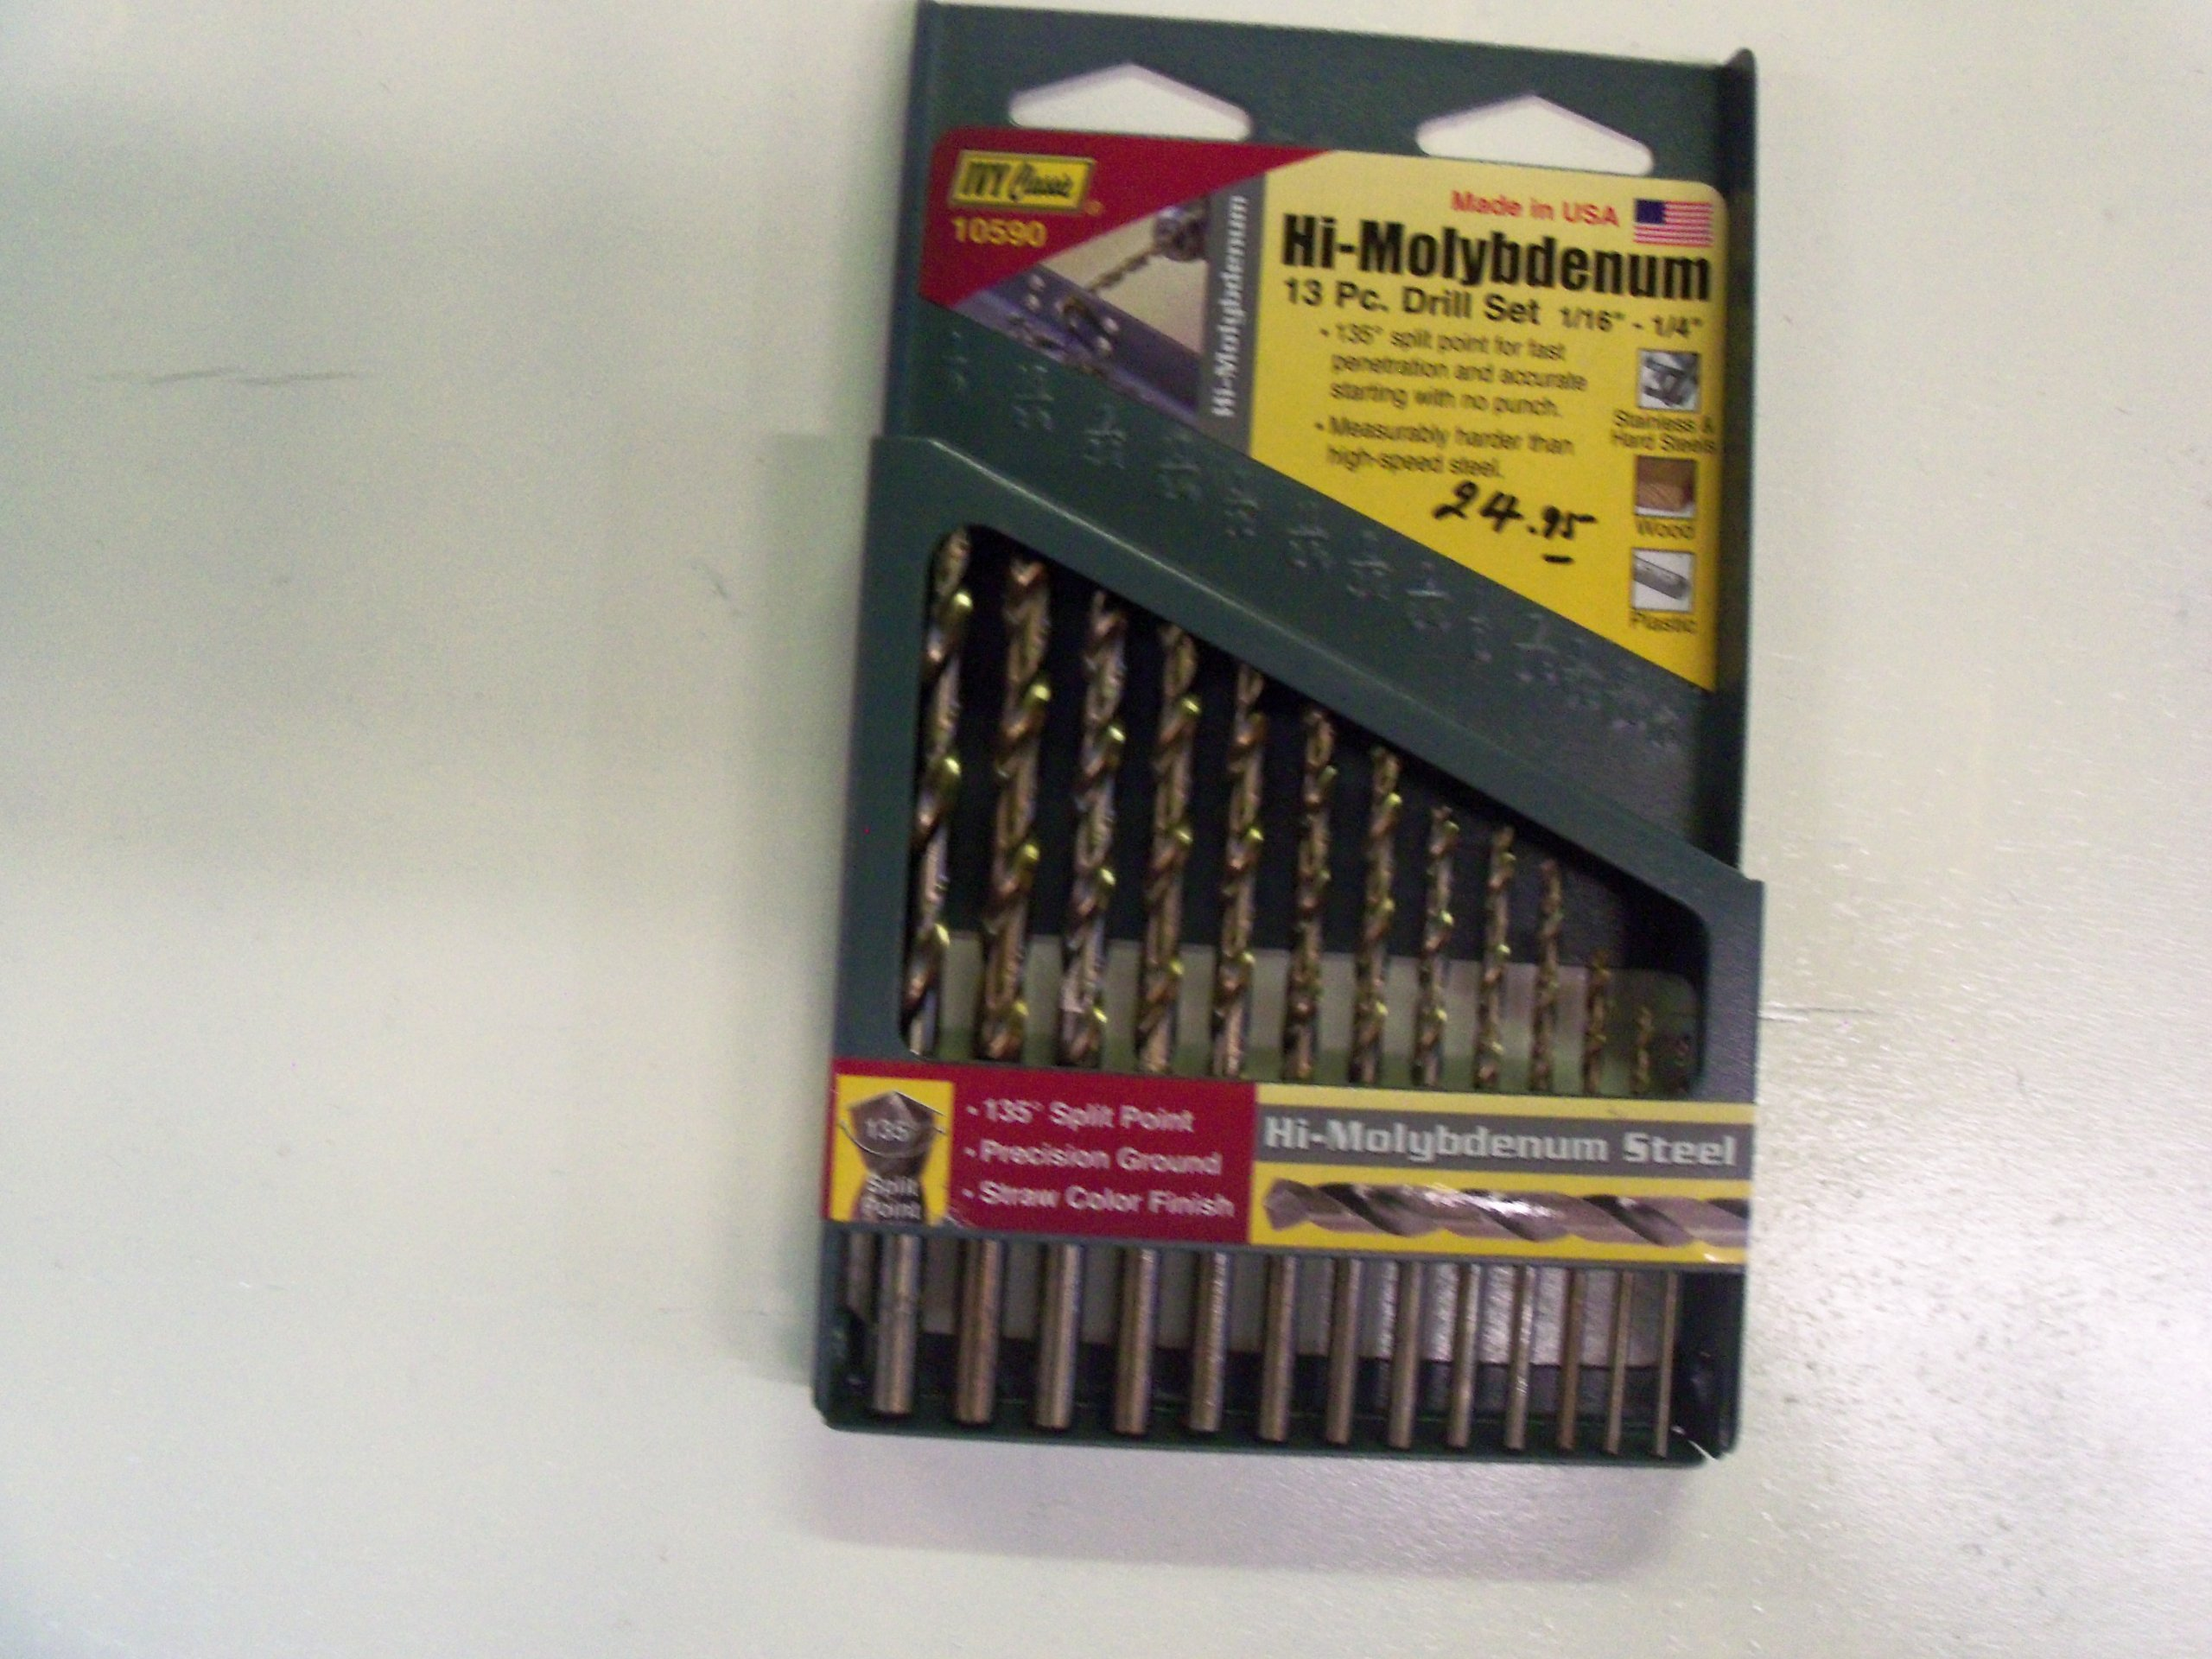 IVY Classic 10590 13-Piece Hi-Molybdenum Steel Drill Bit Set, 135-Degree Split Point, USA, Sturdy Metal Case